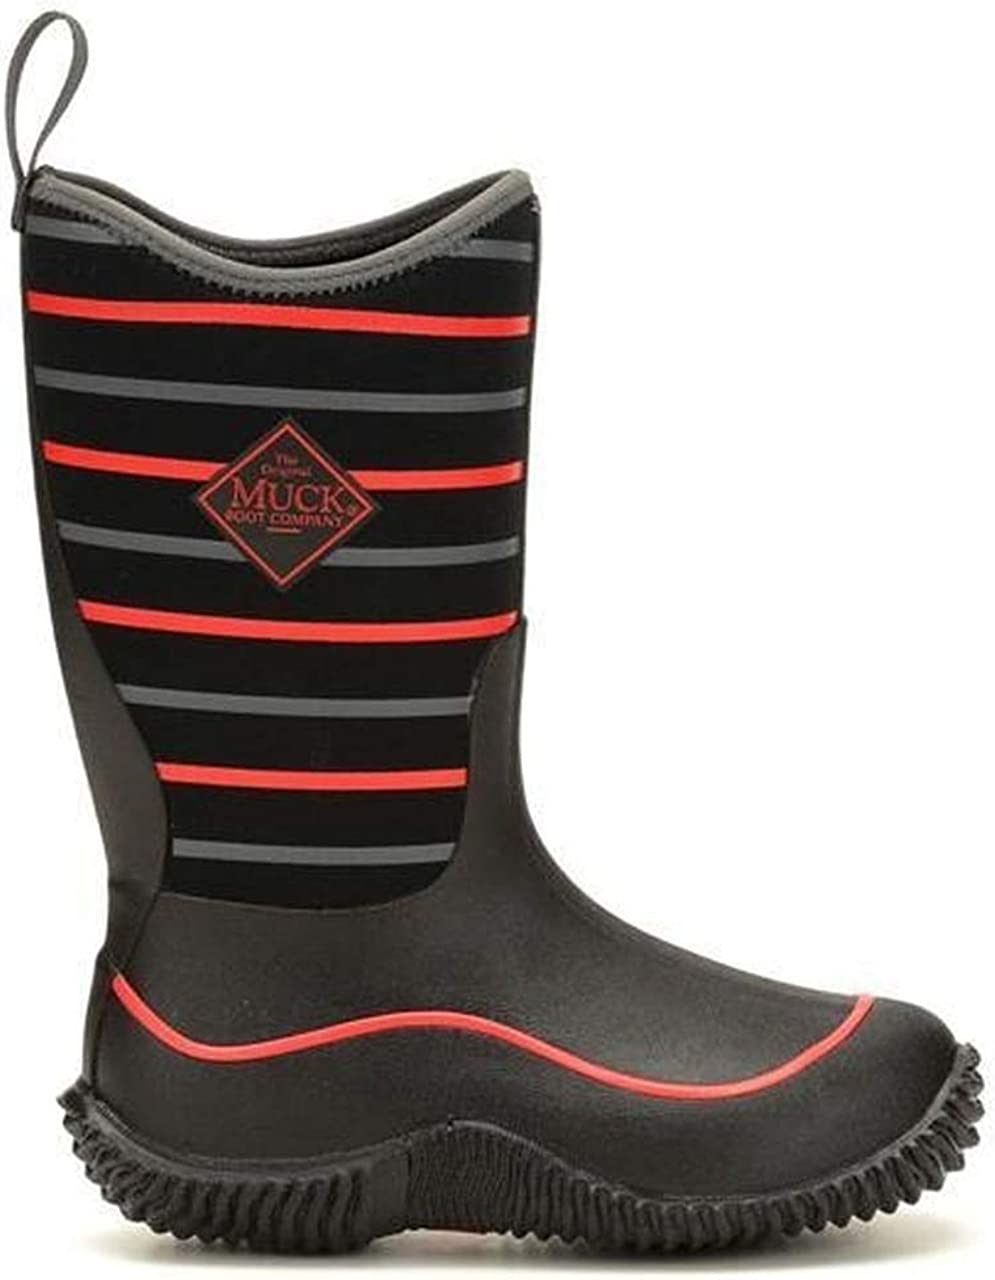 Muck Boot Hale Multi-Season Kids Rubber Boot